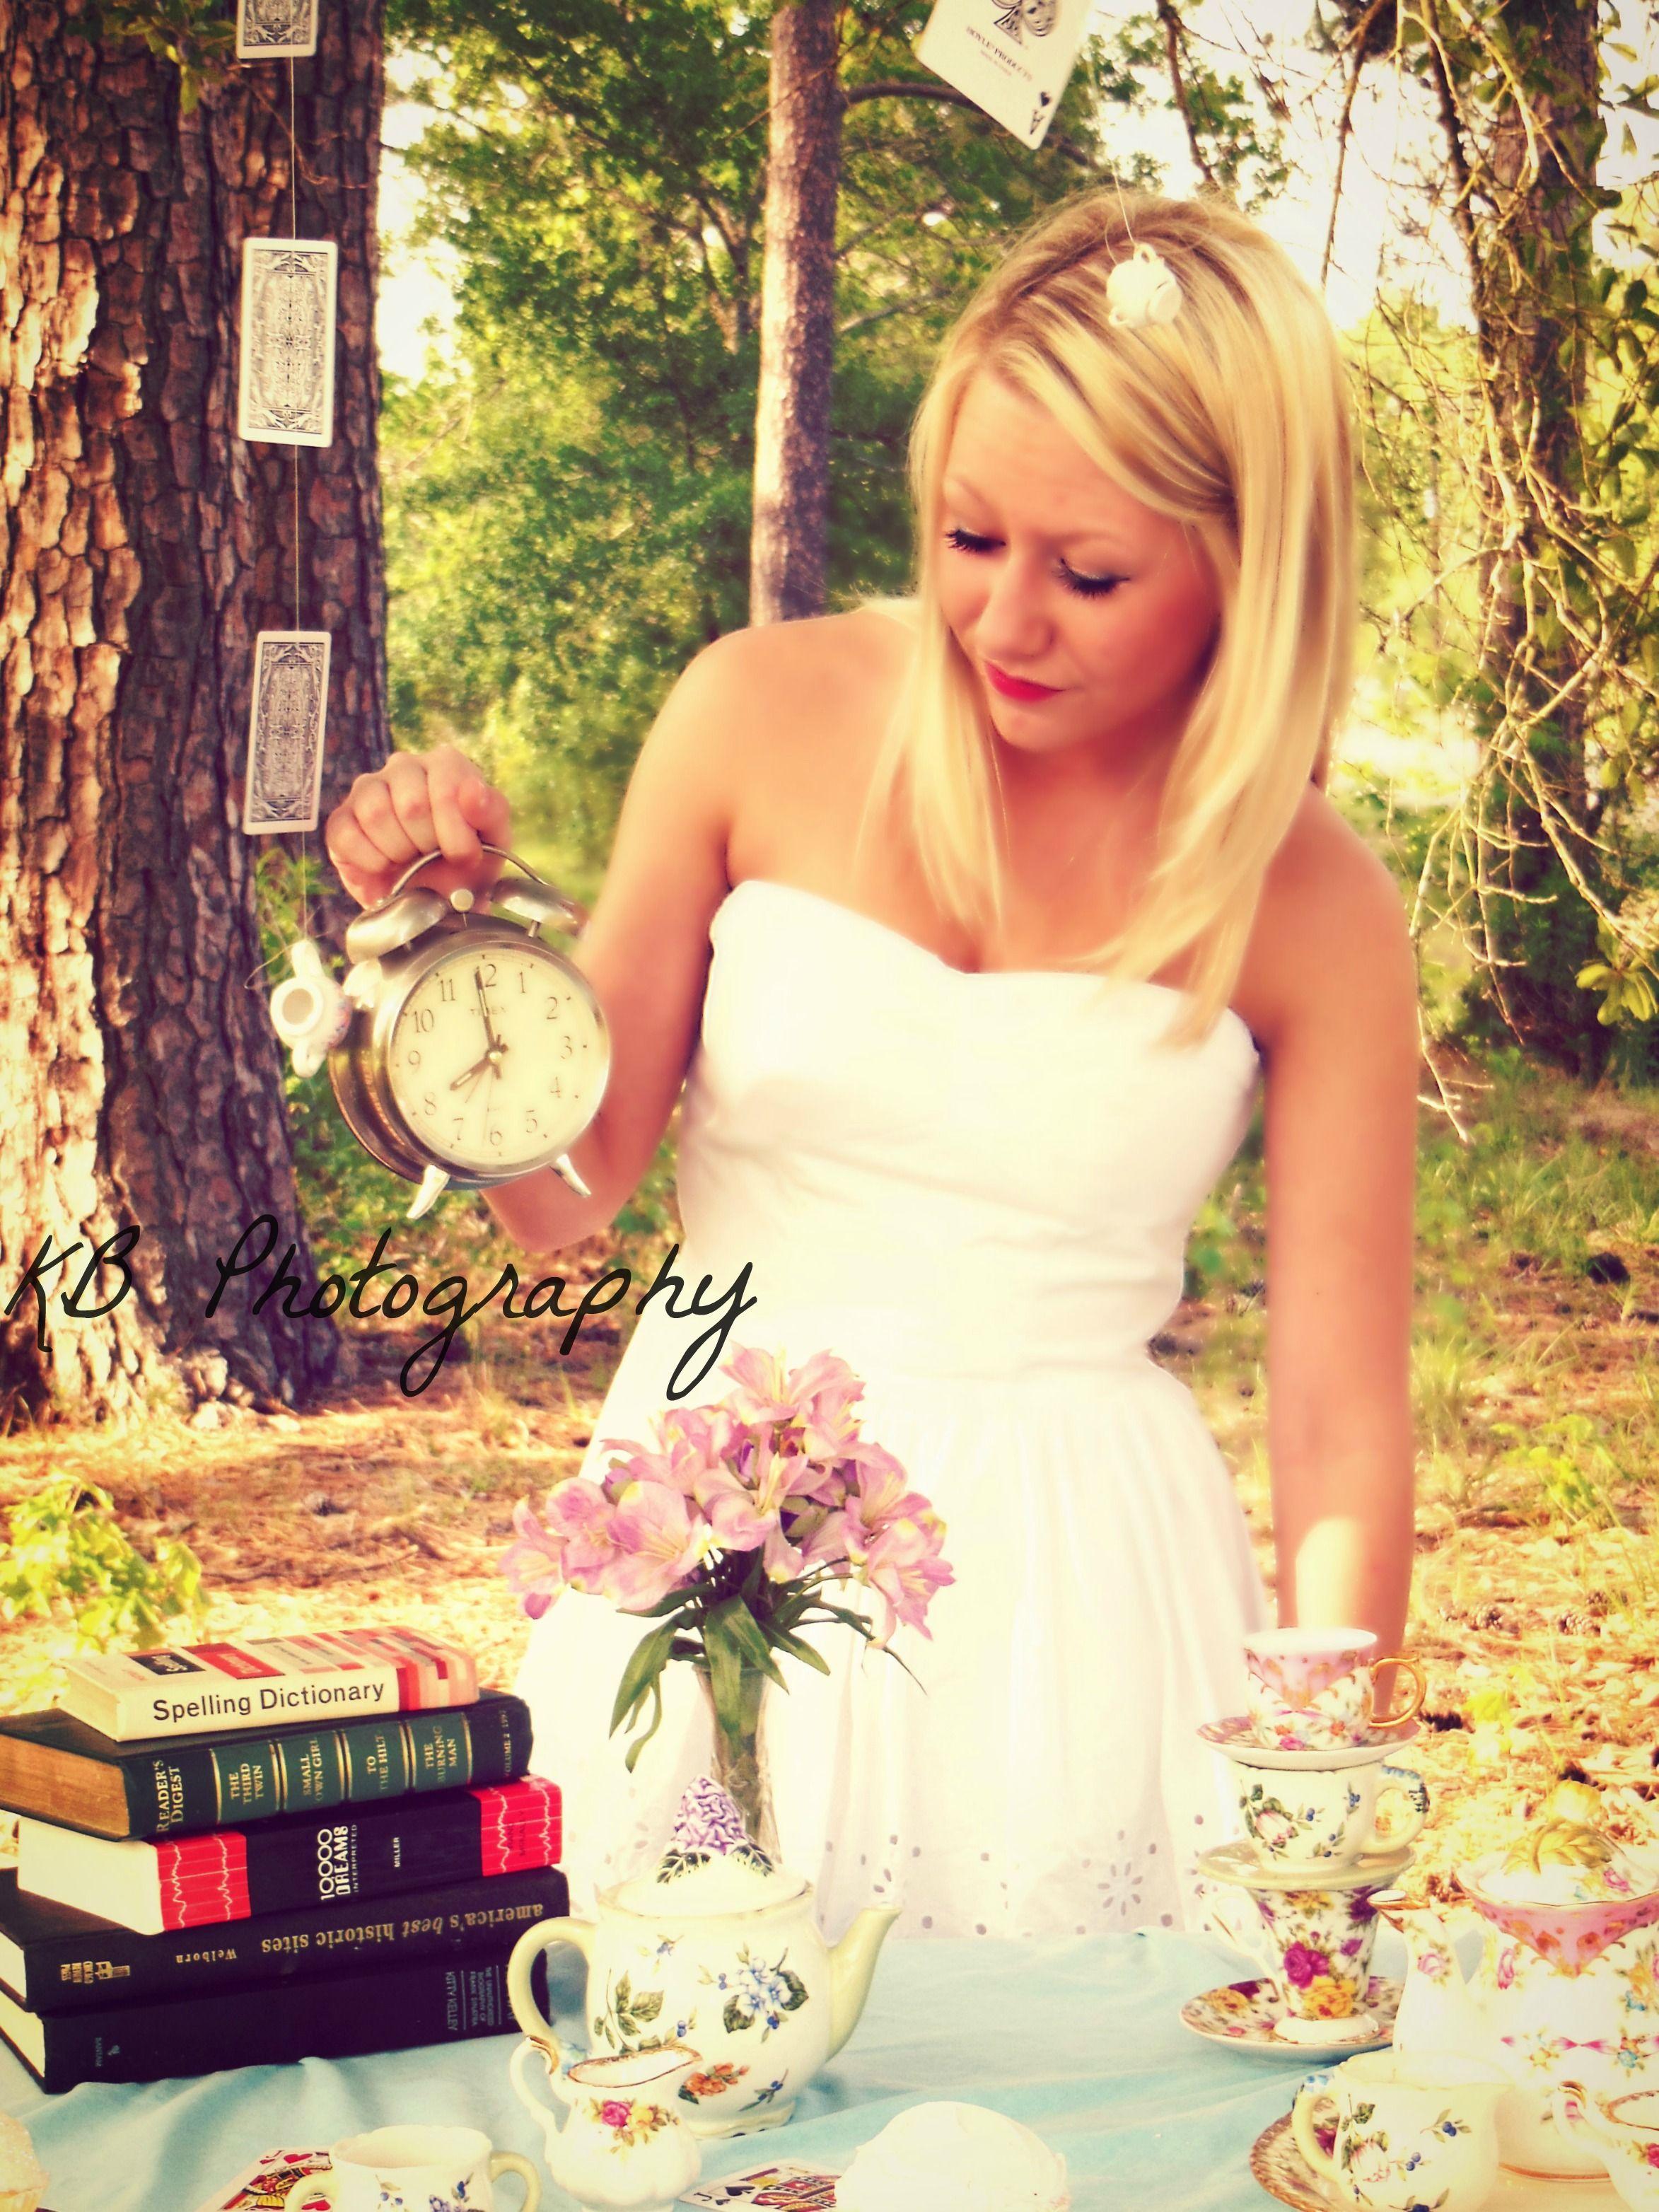 #aliceinwonderland #teaparty #photoshoot #photography #kbphotography #myversion #teacup #books #flowers #cards #alice #disney #fantasy